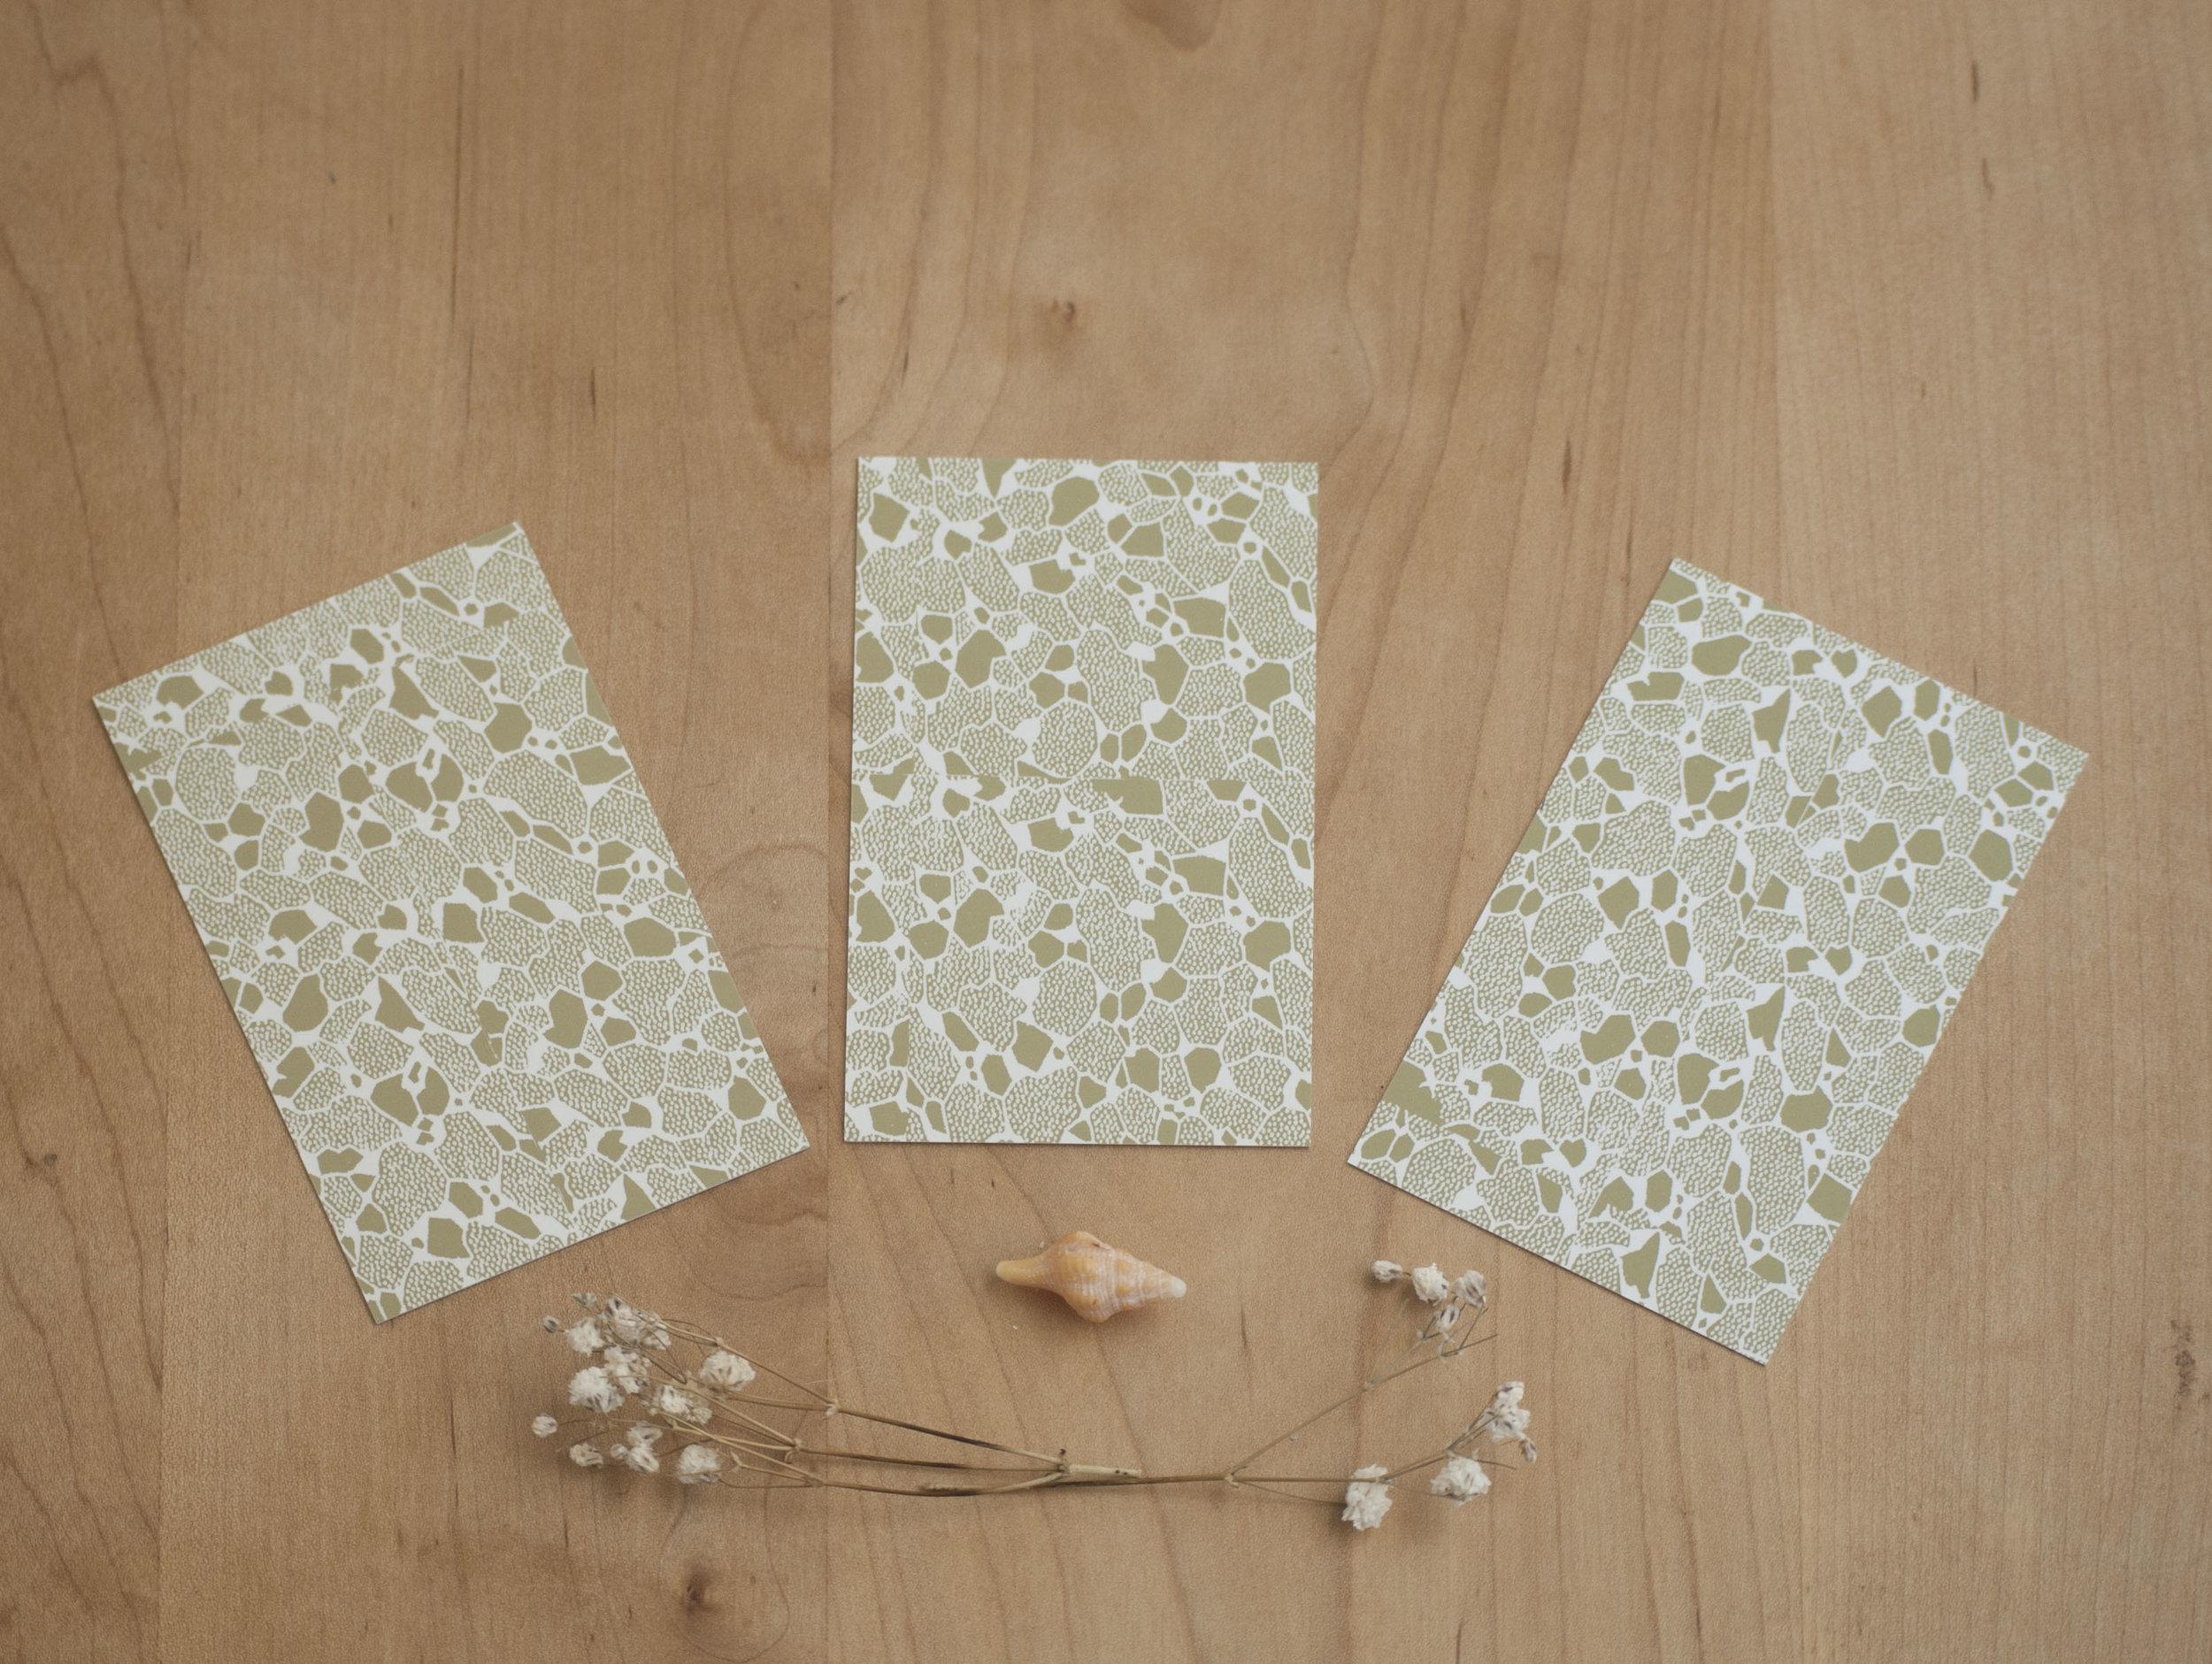 Three Card Tarot Spread